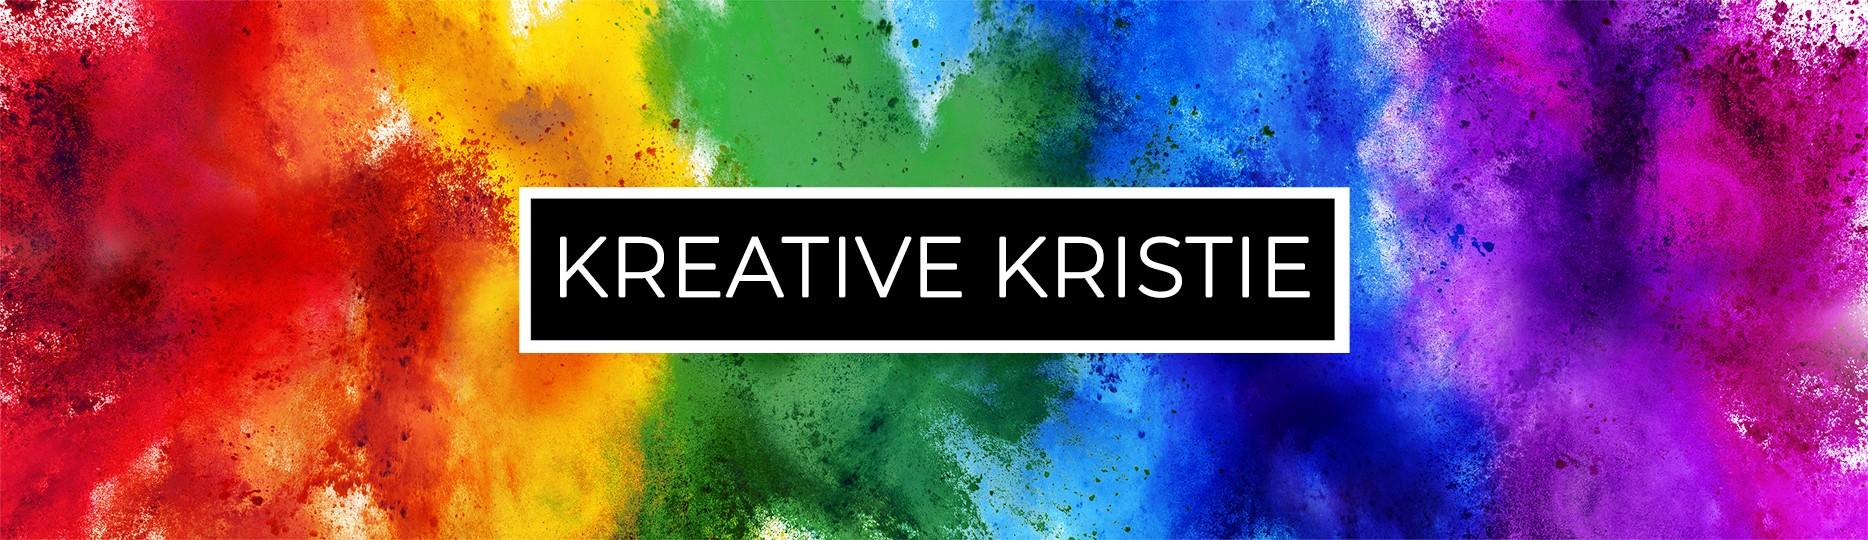 Kreative Kristie